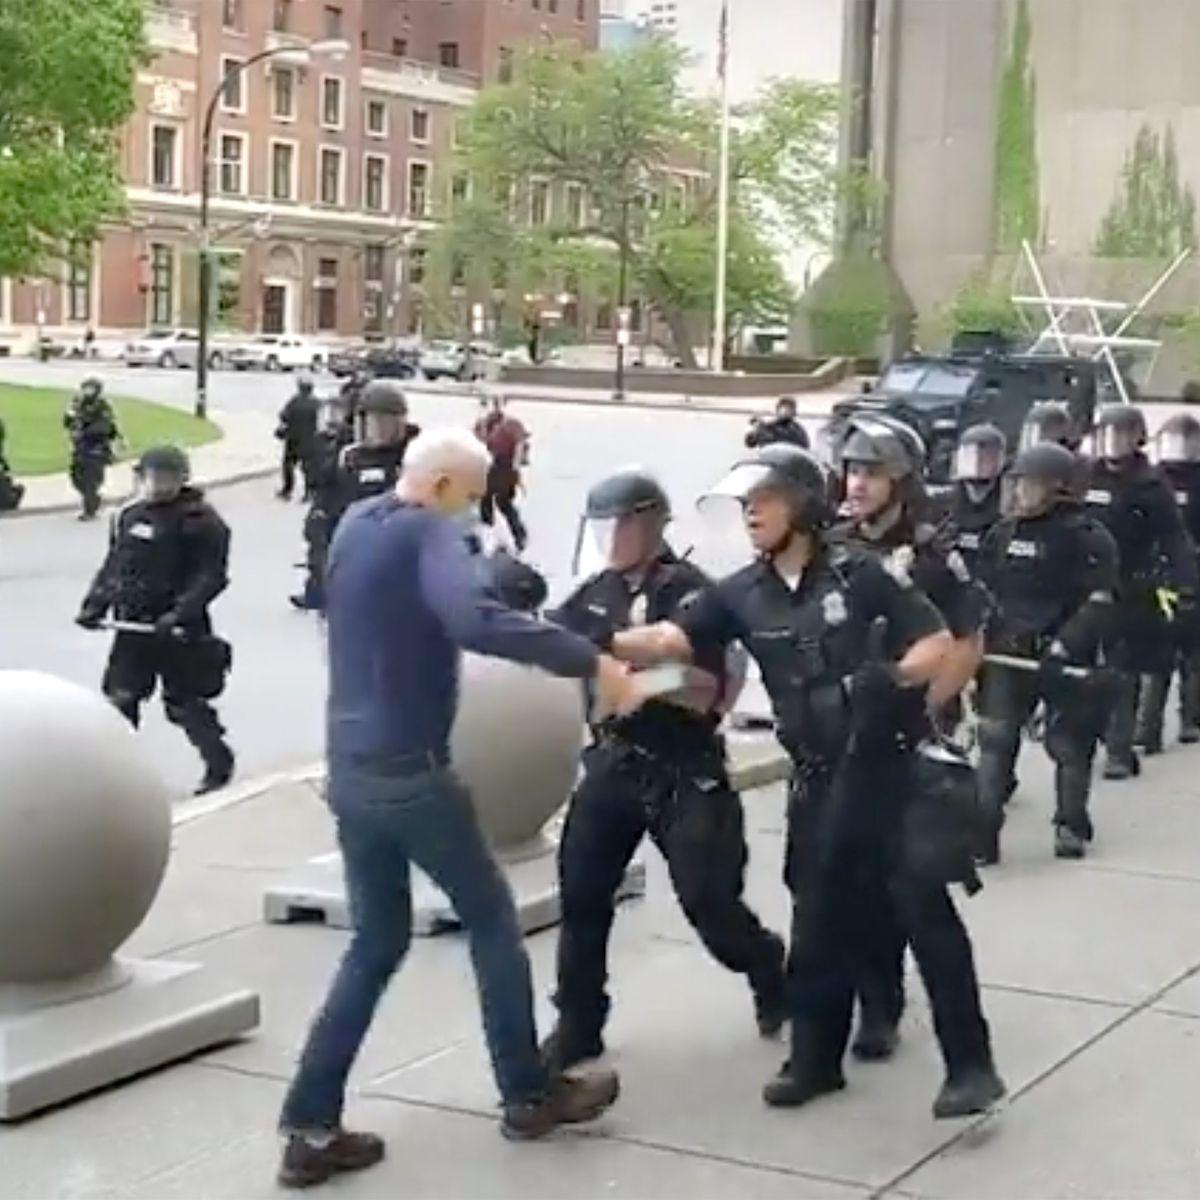 Buffalo police shoving incident